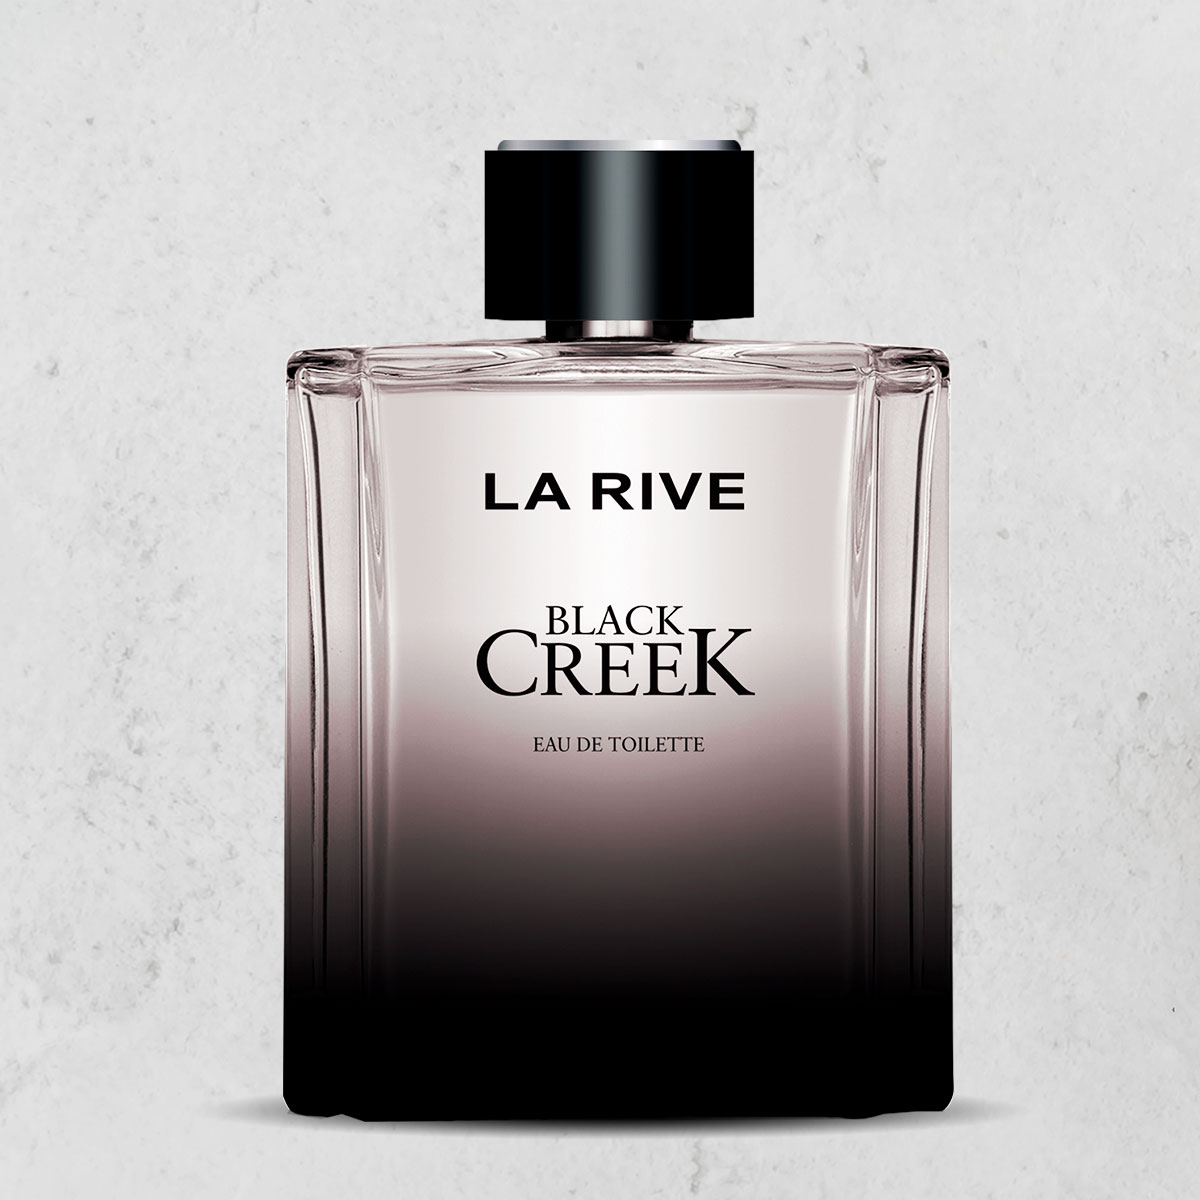 Perfume Importado Masculino Black Creek Edt 100ml La Rive  - Mercari Perfumes